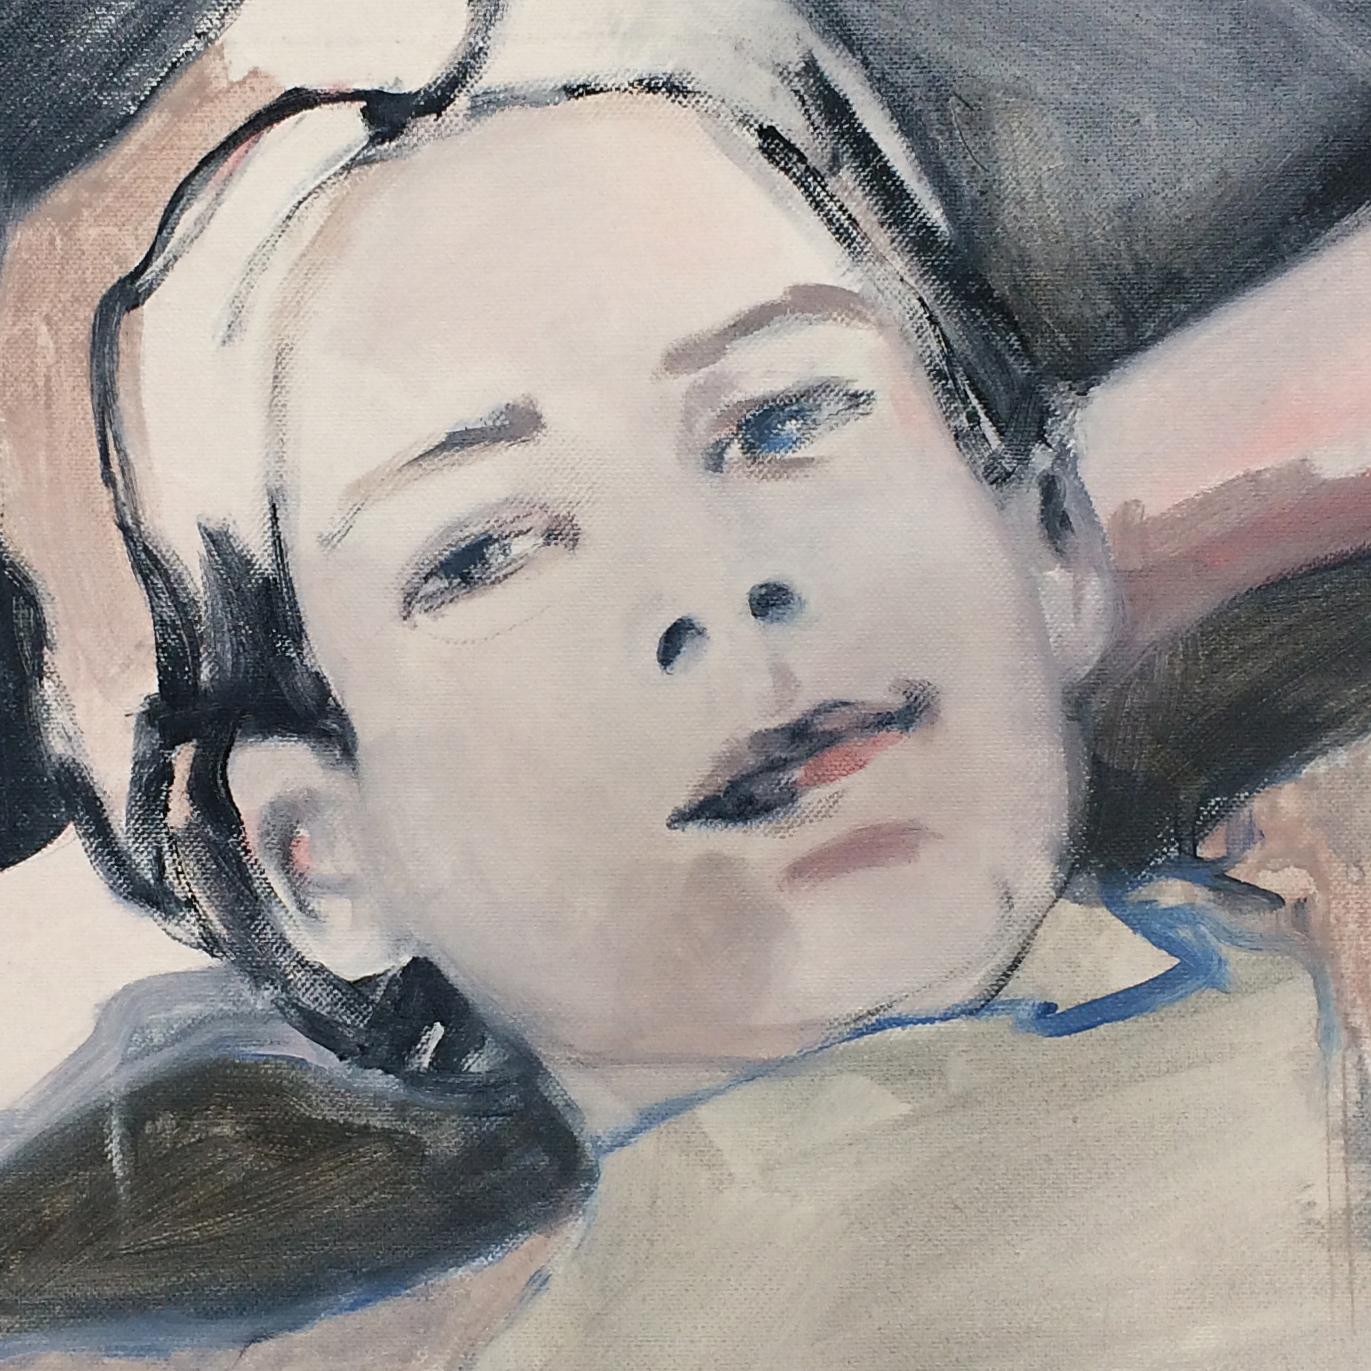 The Boy 30x30cm acrylics on canvas #SOLD